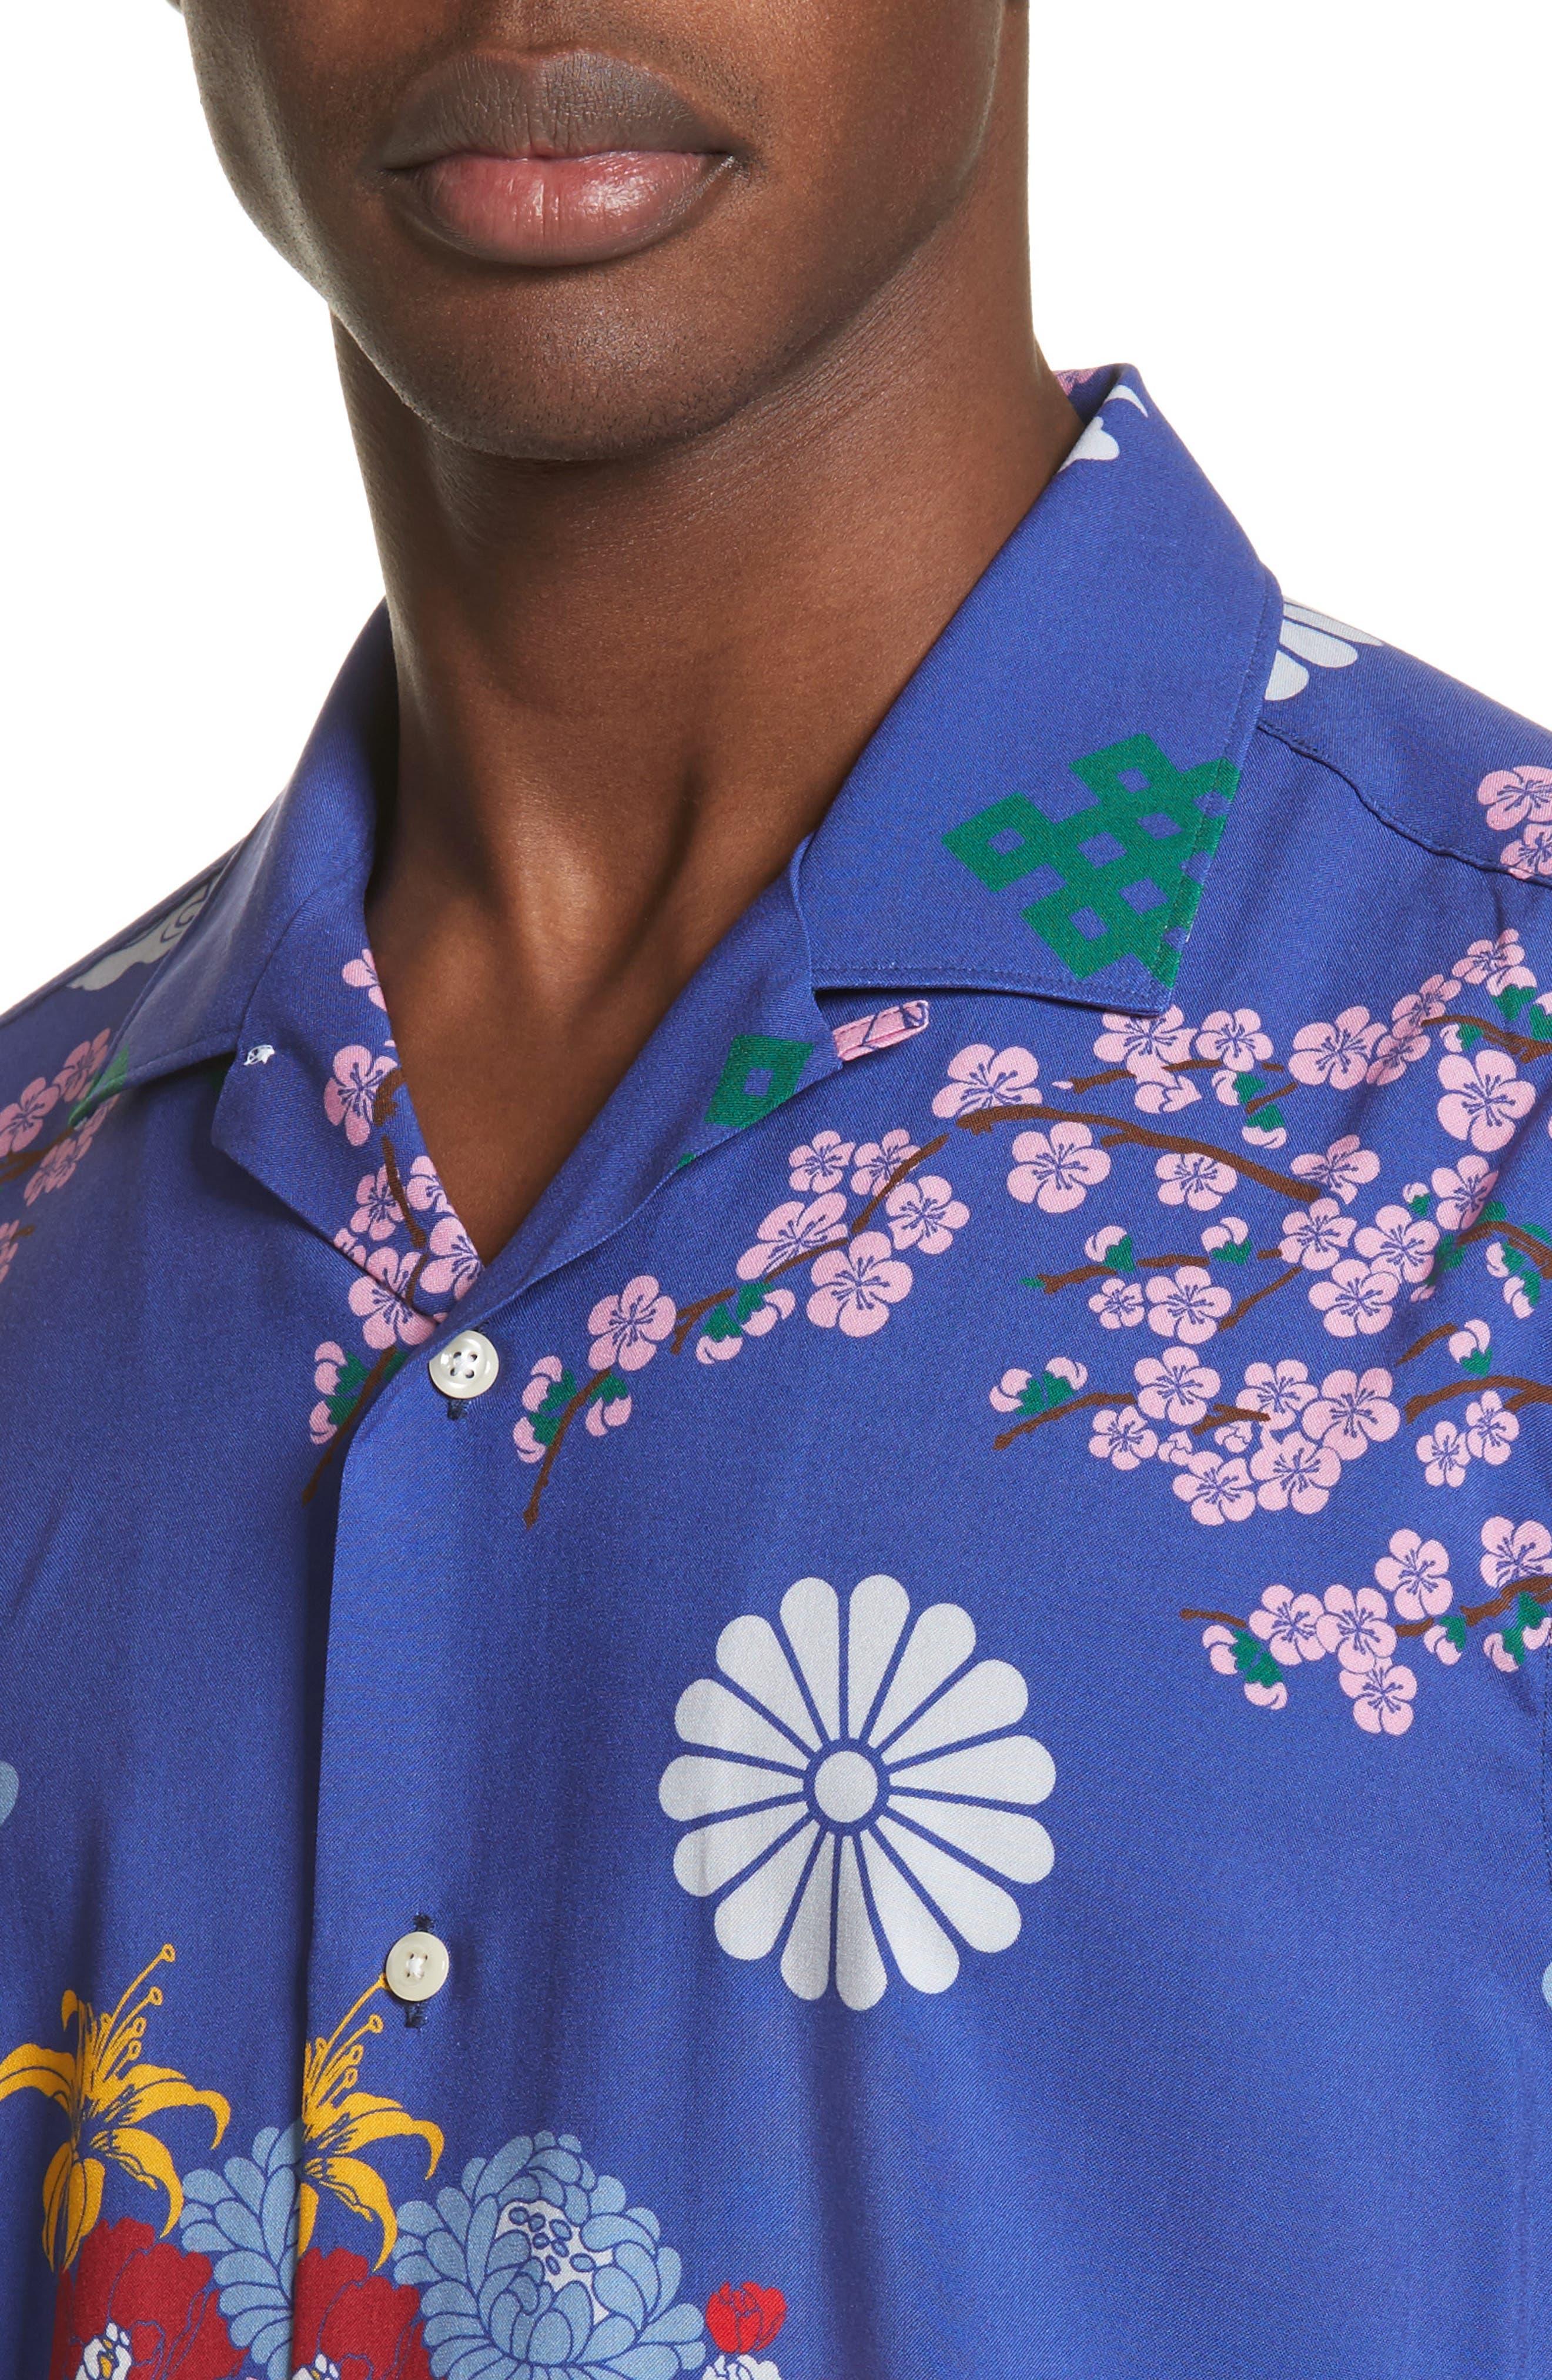 x The North Face Men's Floral Print Camp Shirt,                             Alternate thumbnail 5, color,                             400